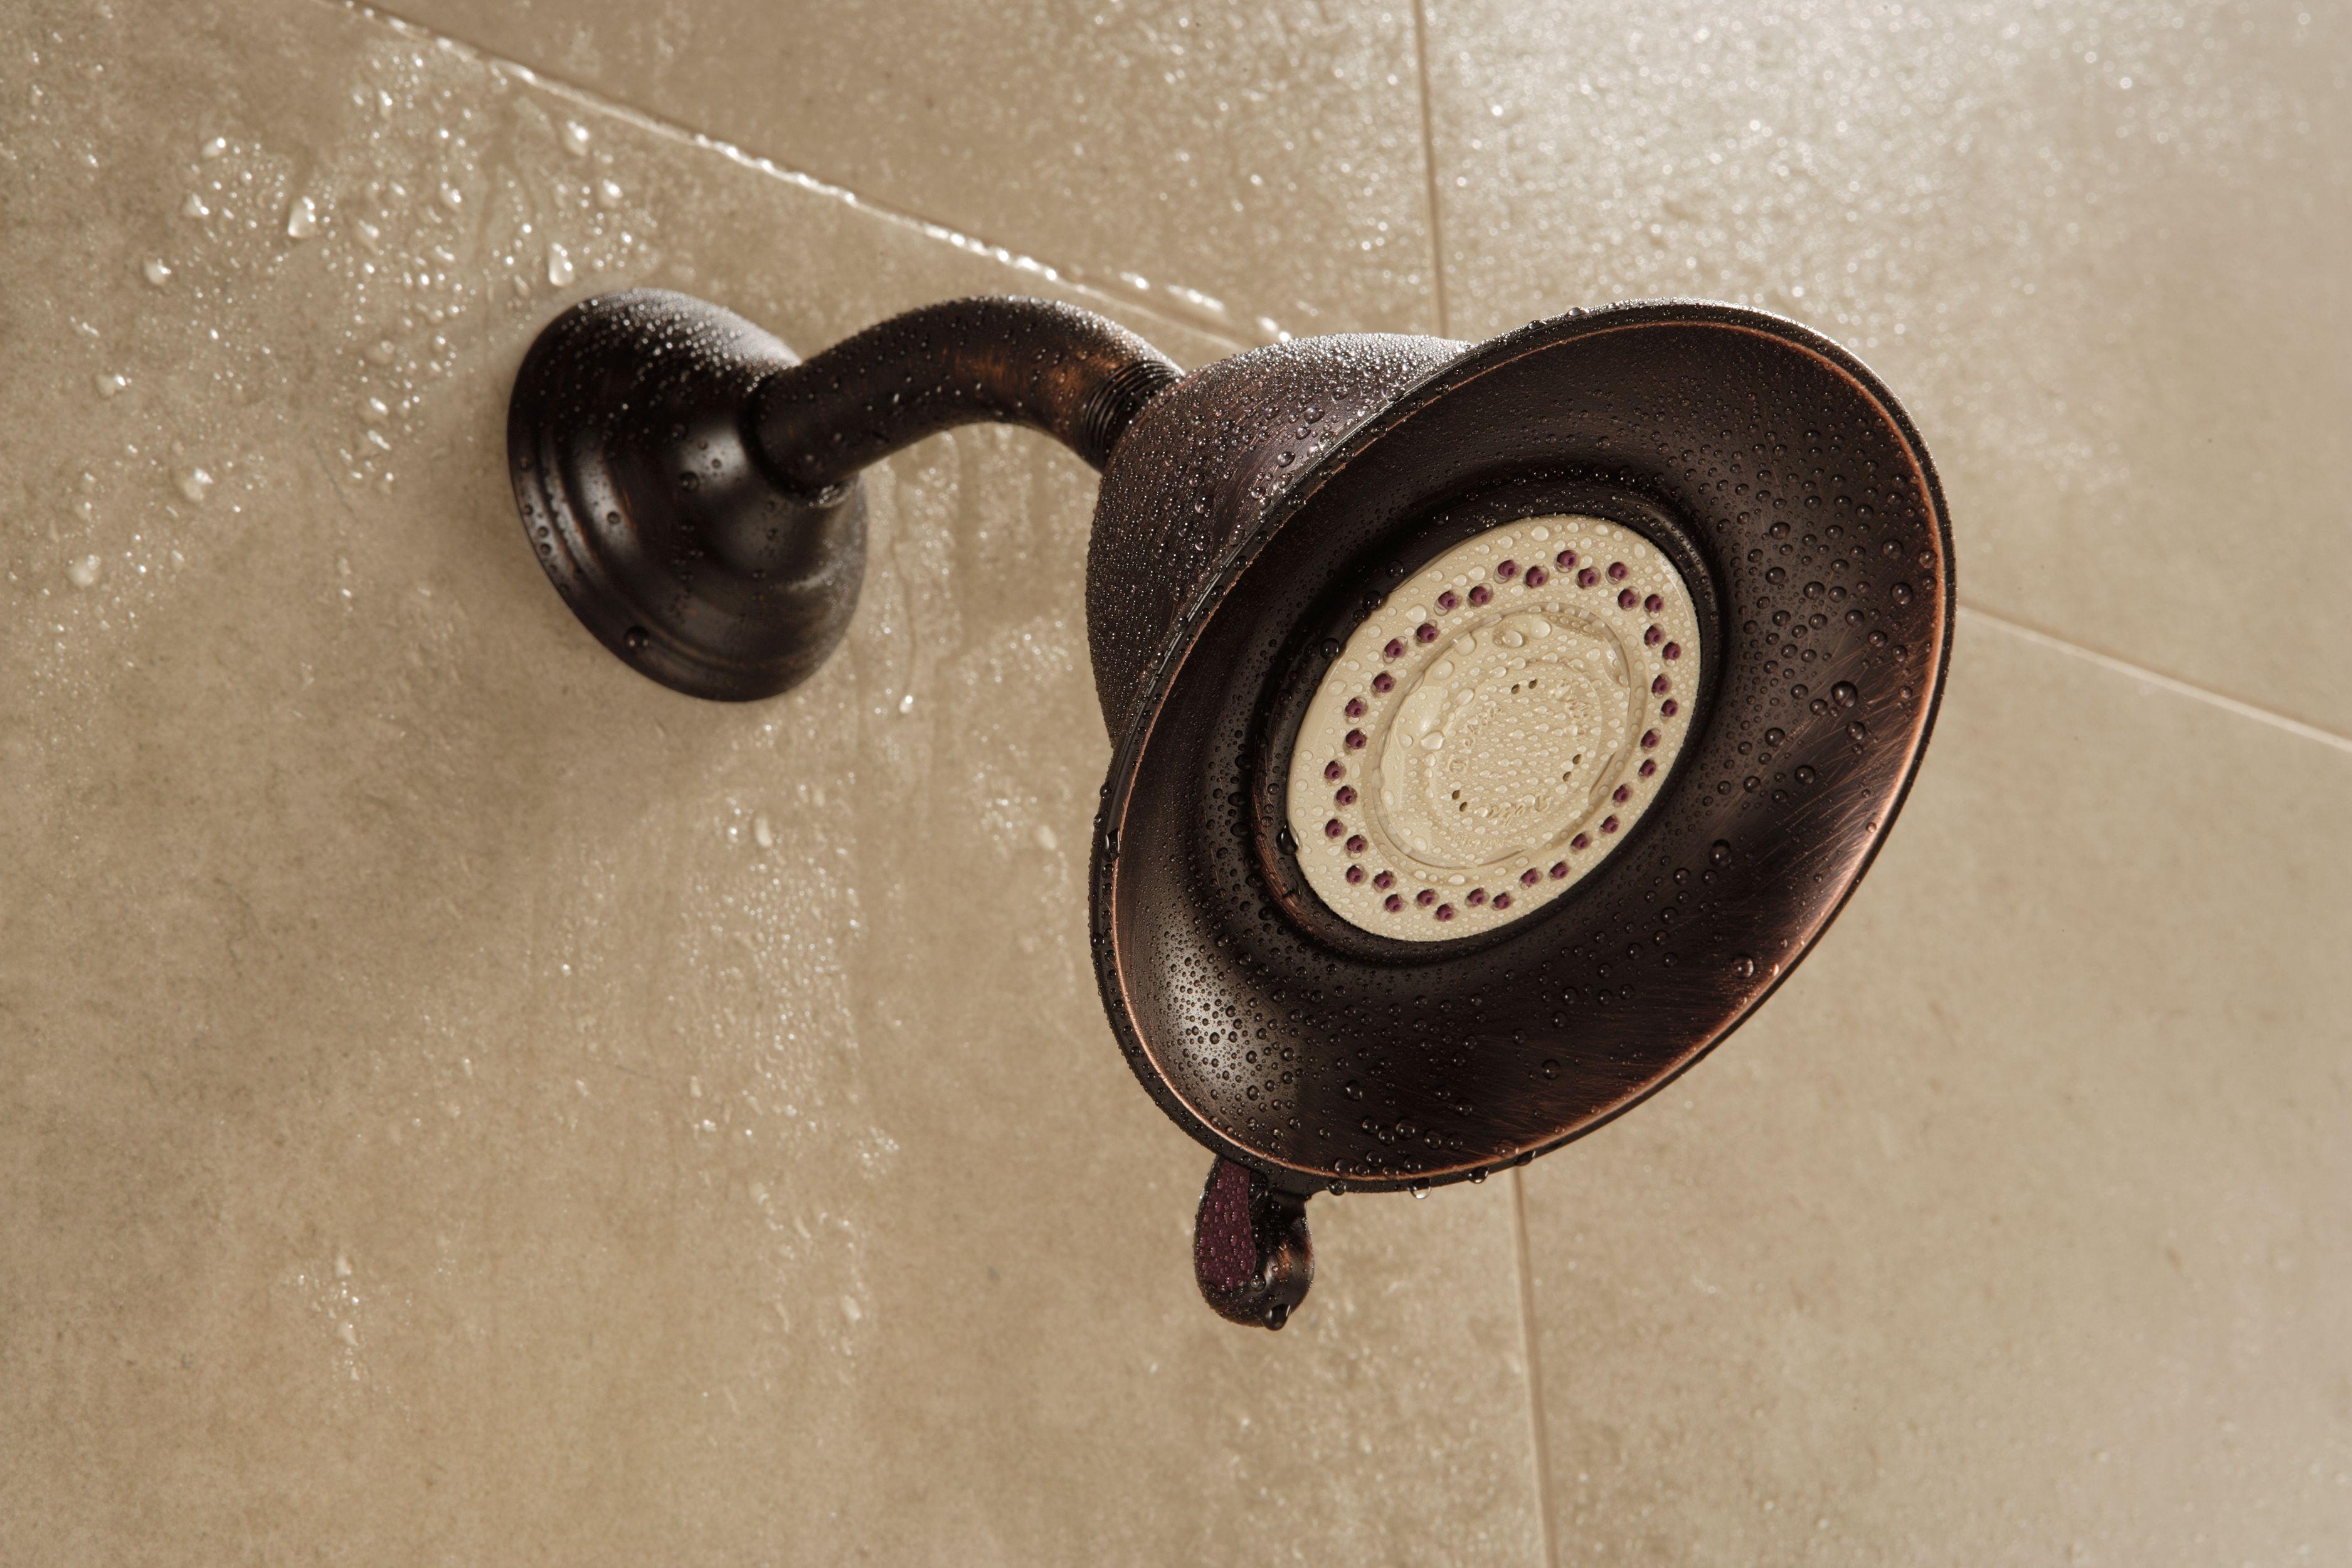 home improvement speakman s and arm head modona wayfair with flange shower rainshower pdx reviews